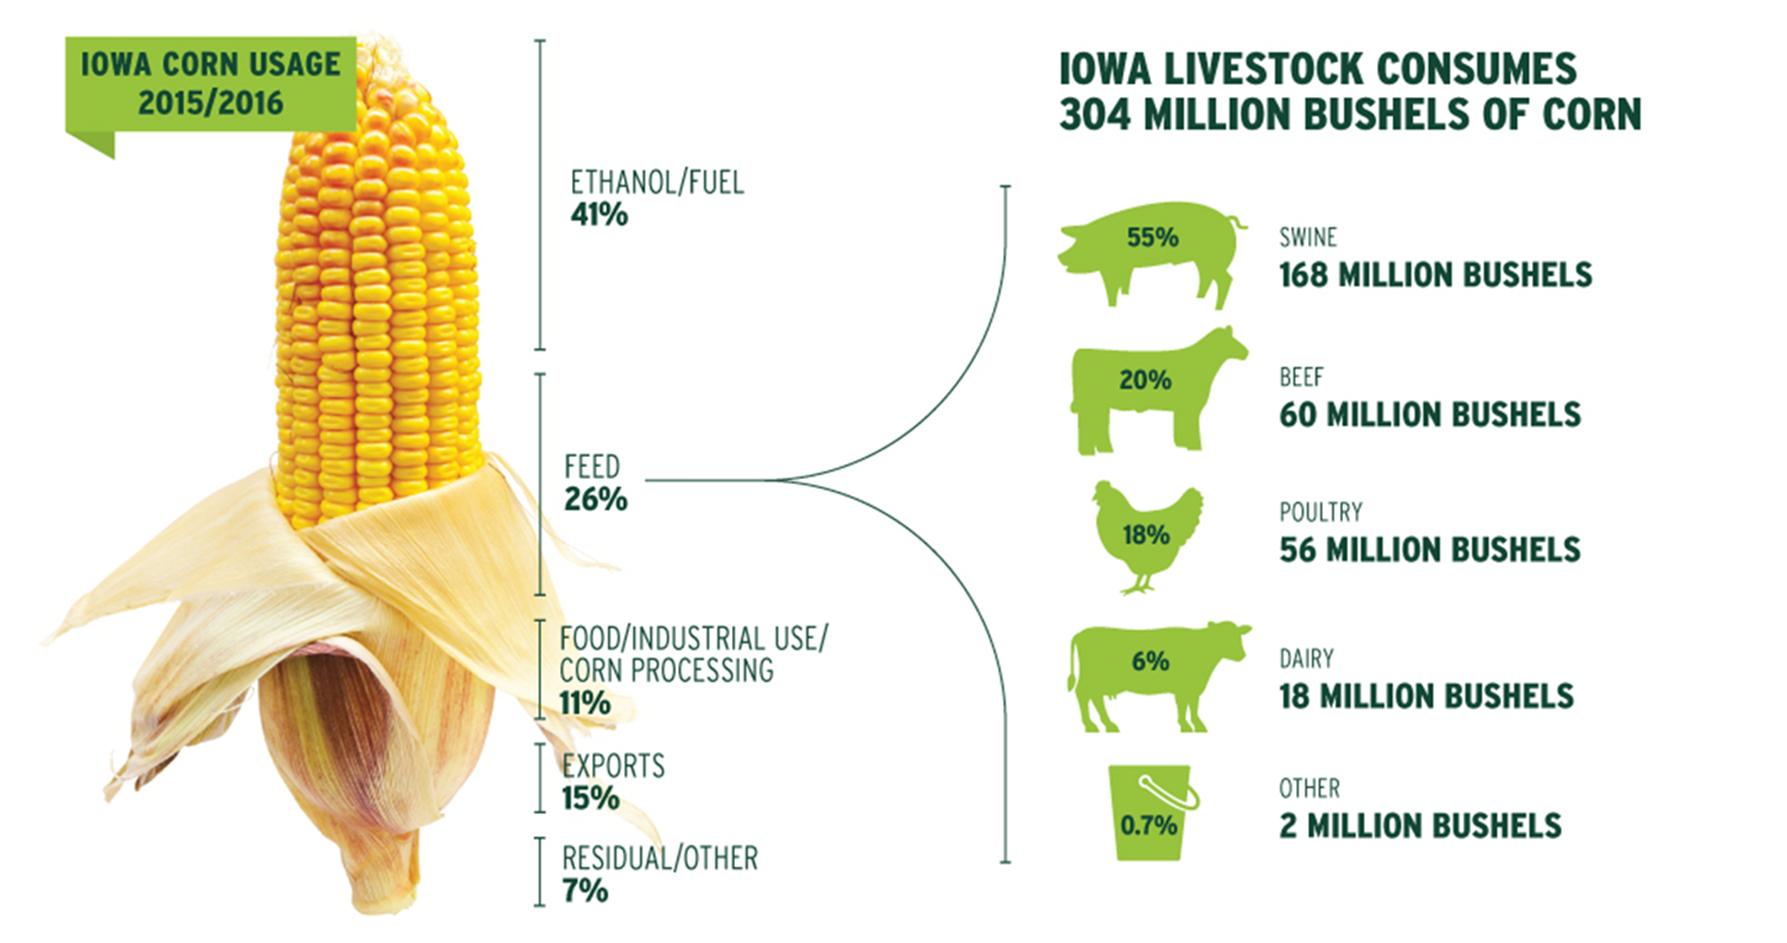 How is Iowa Corn used?